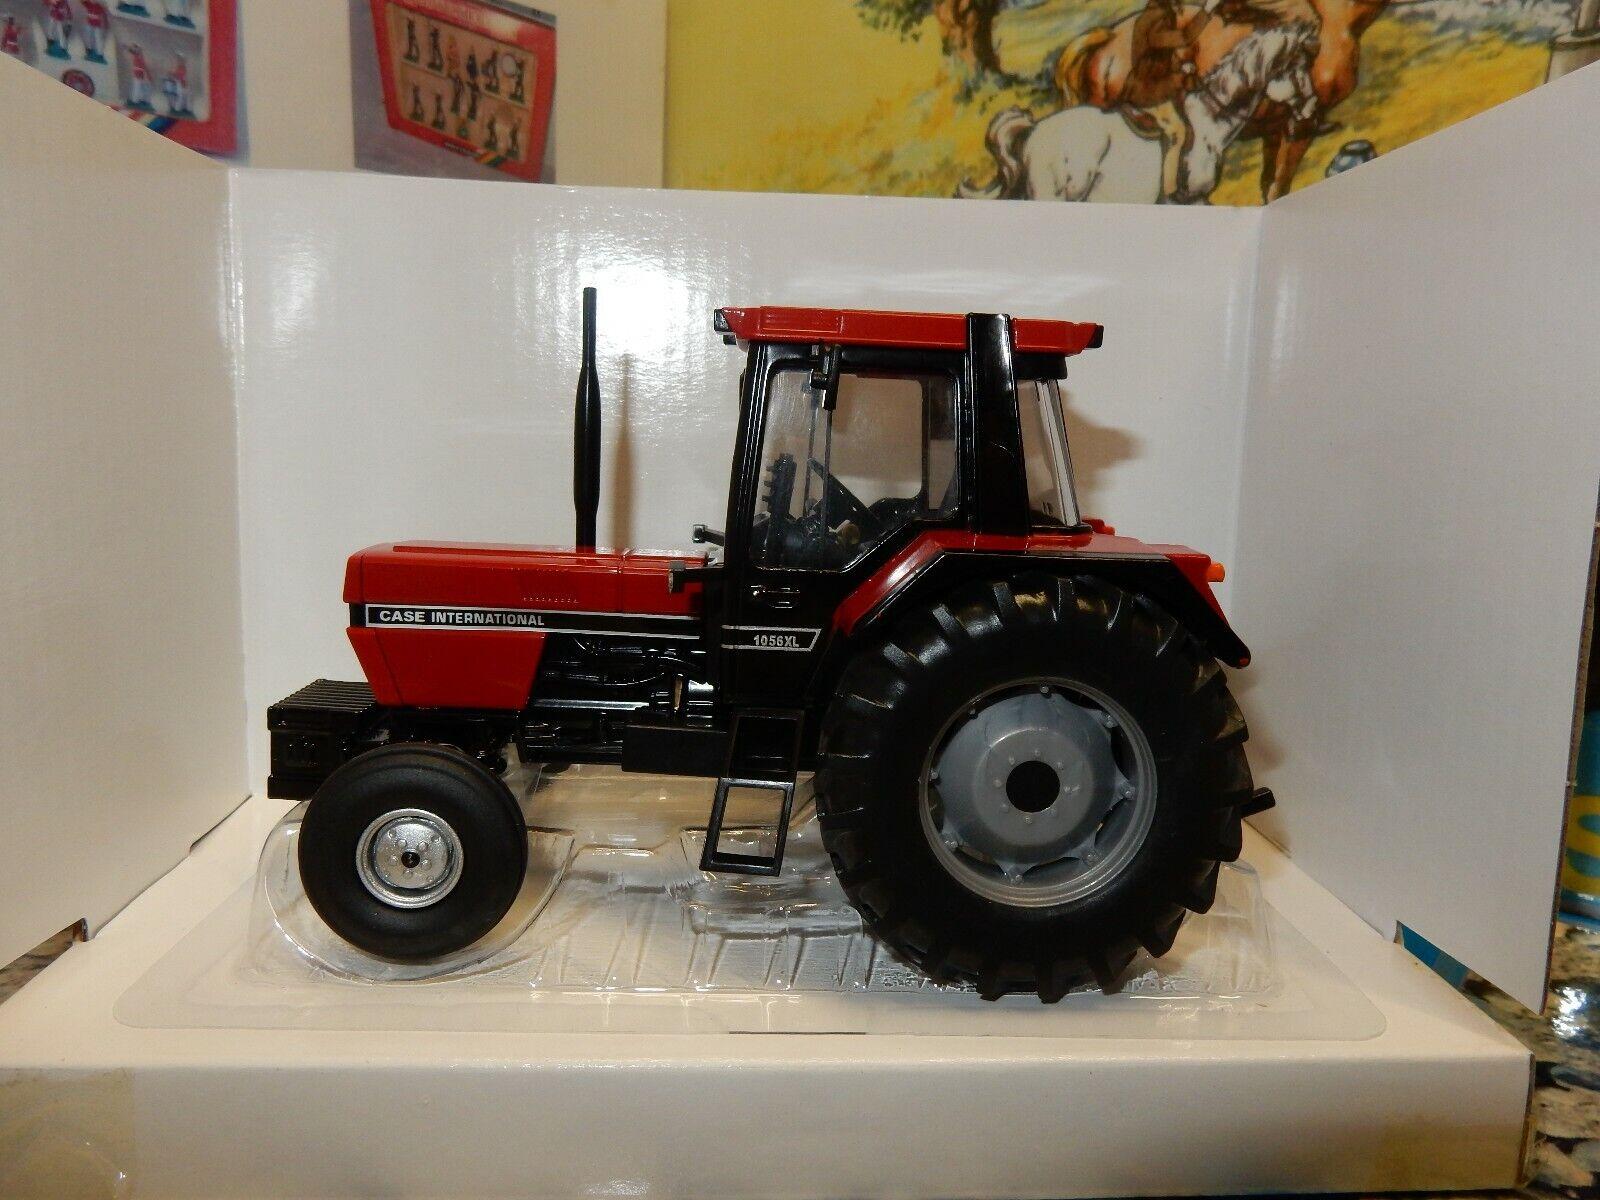 Britains Farm Case IH 1056xl 2WD Tractor 1 32 Die-cast Model....Brand New....